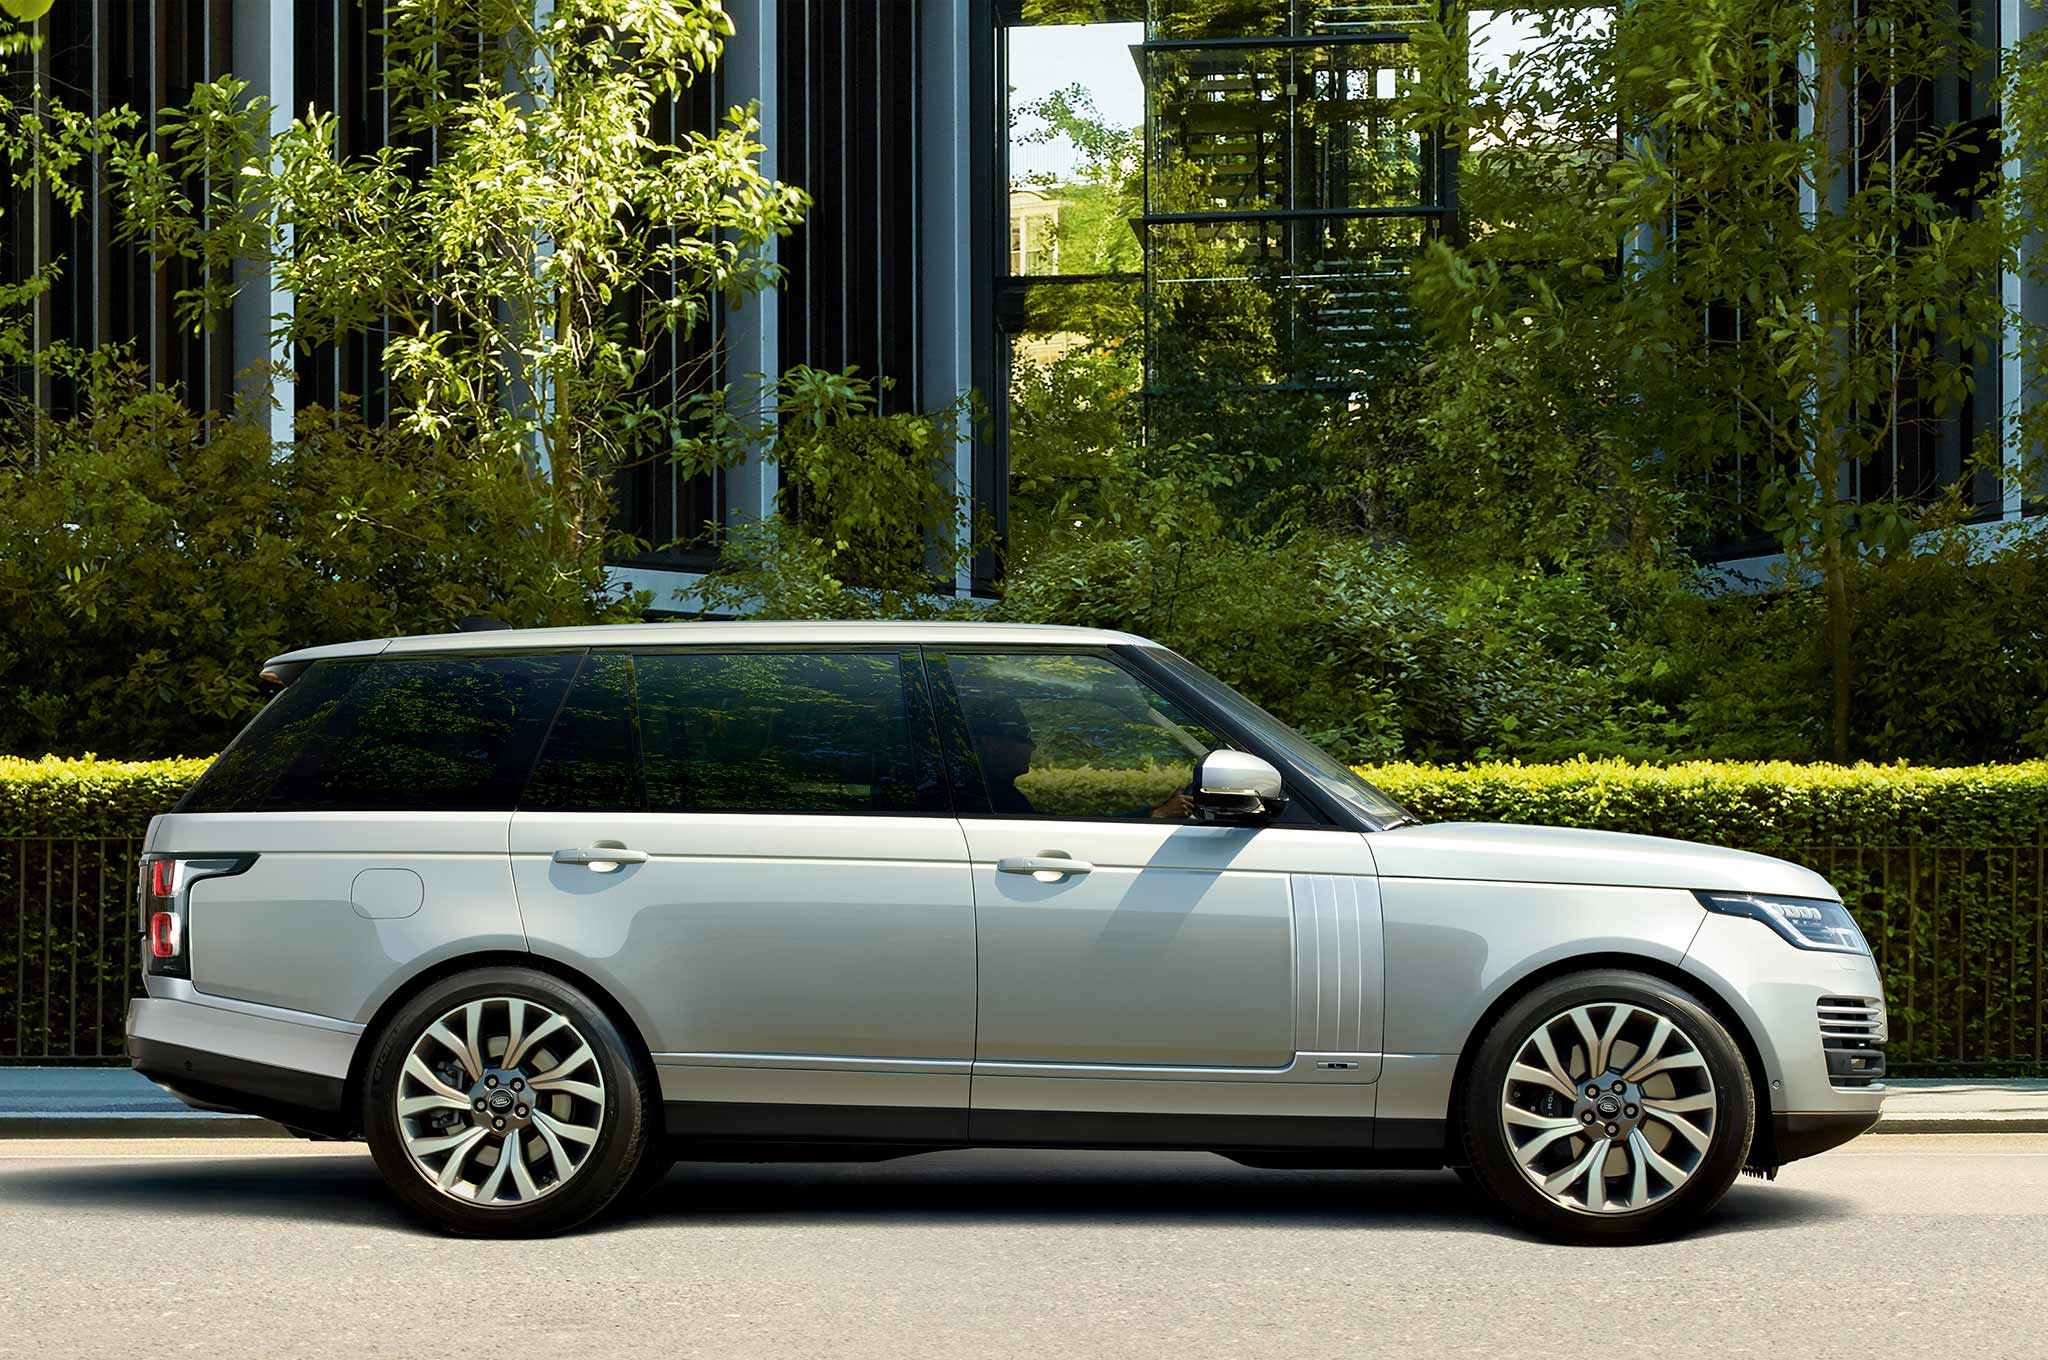 Jaguar Land Rover announces hybrid 2019 Range Rover P400e